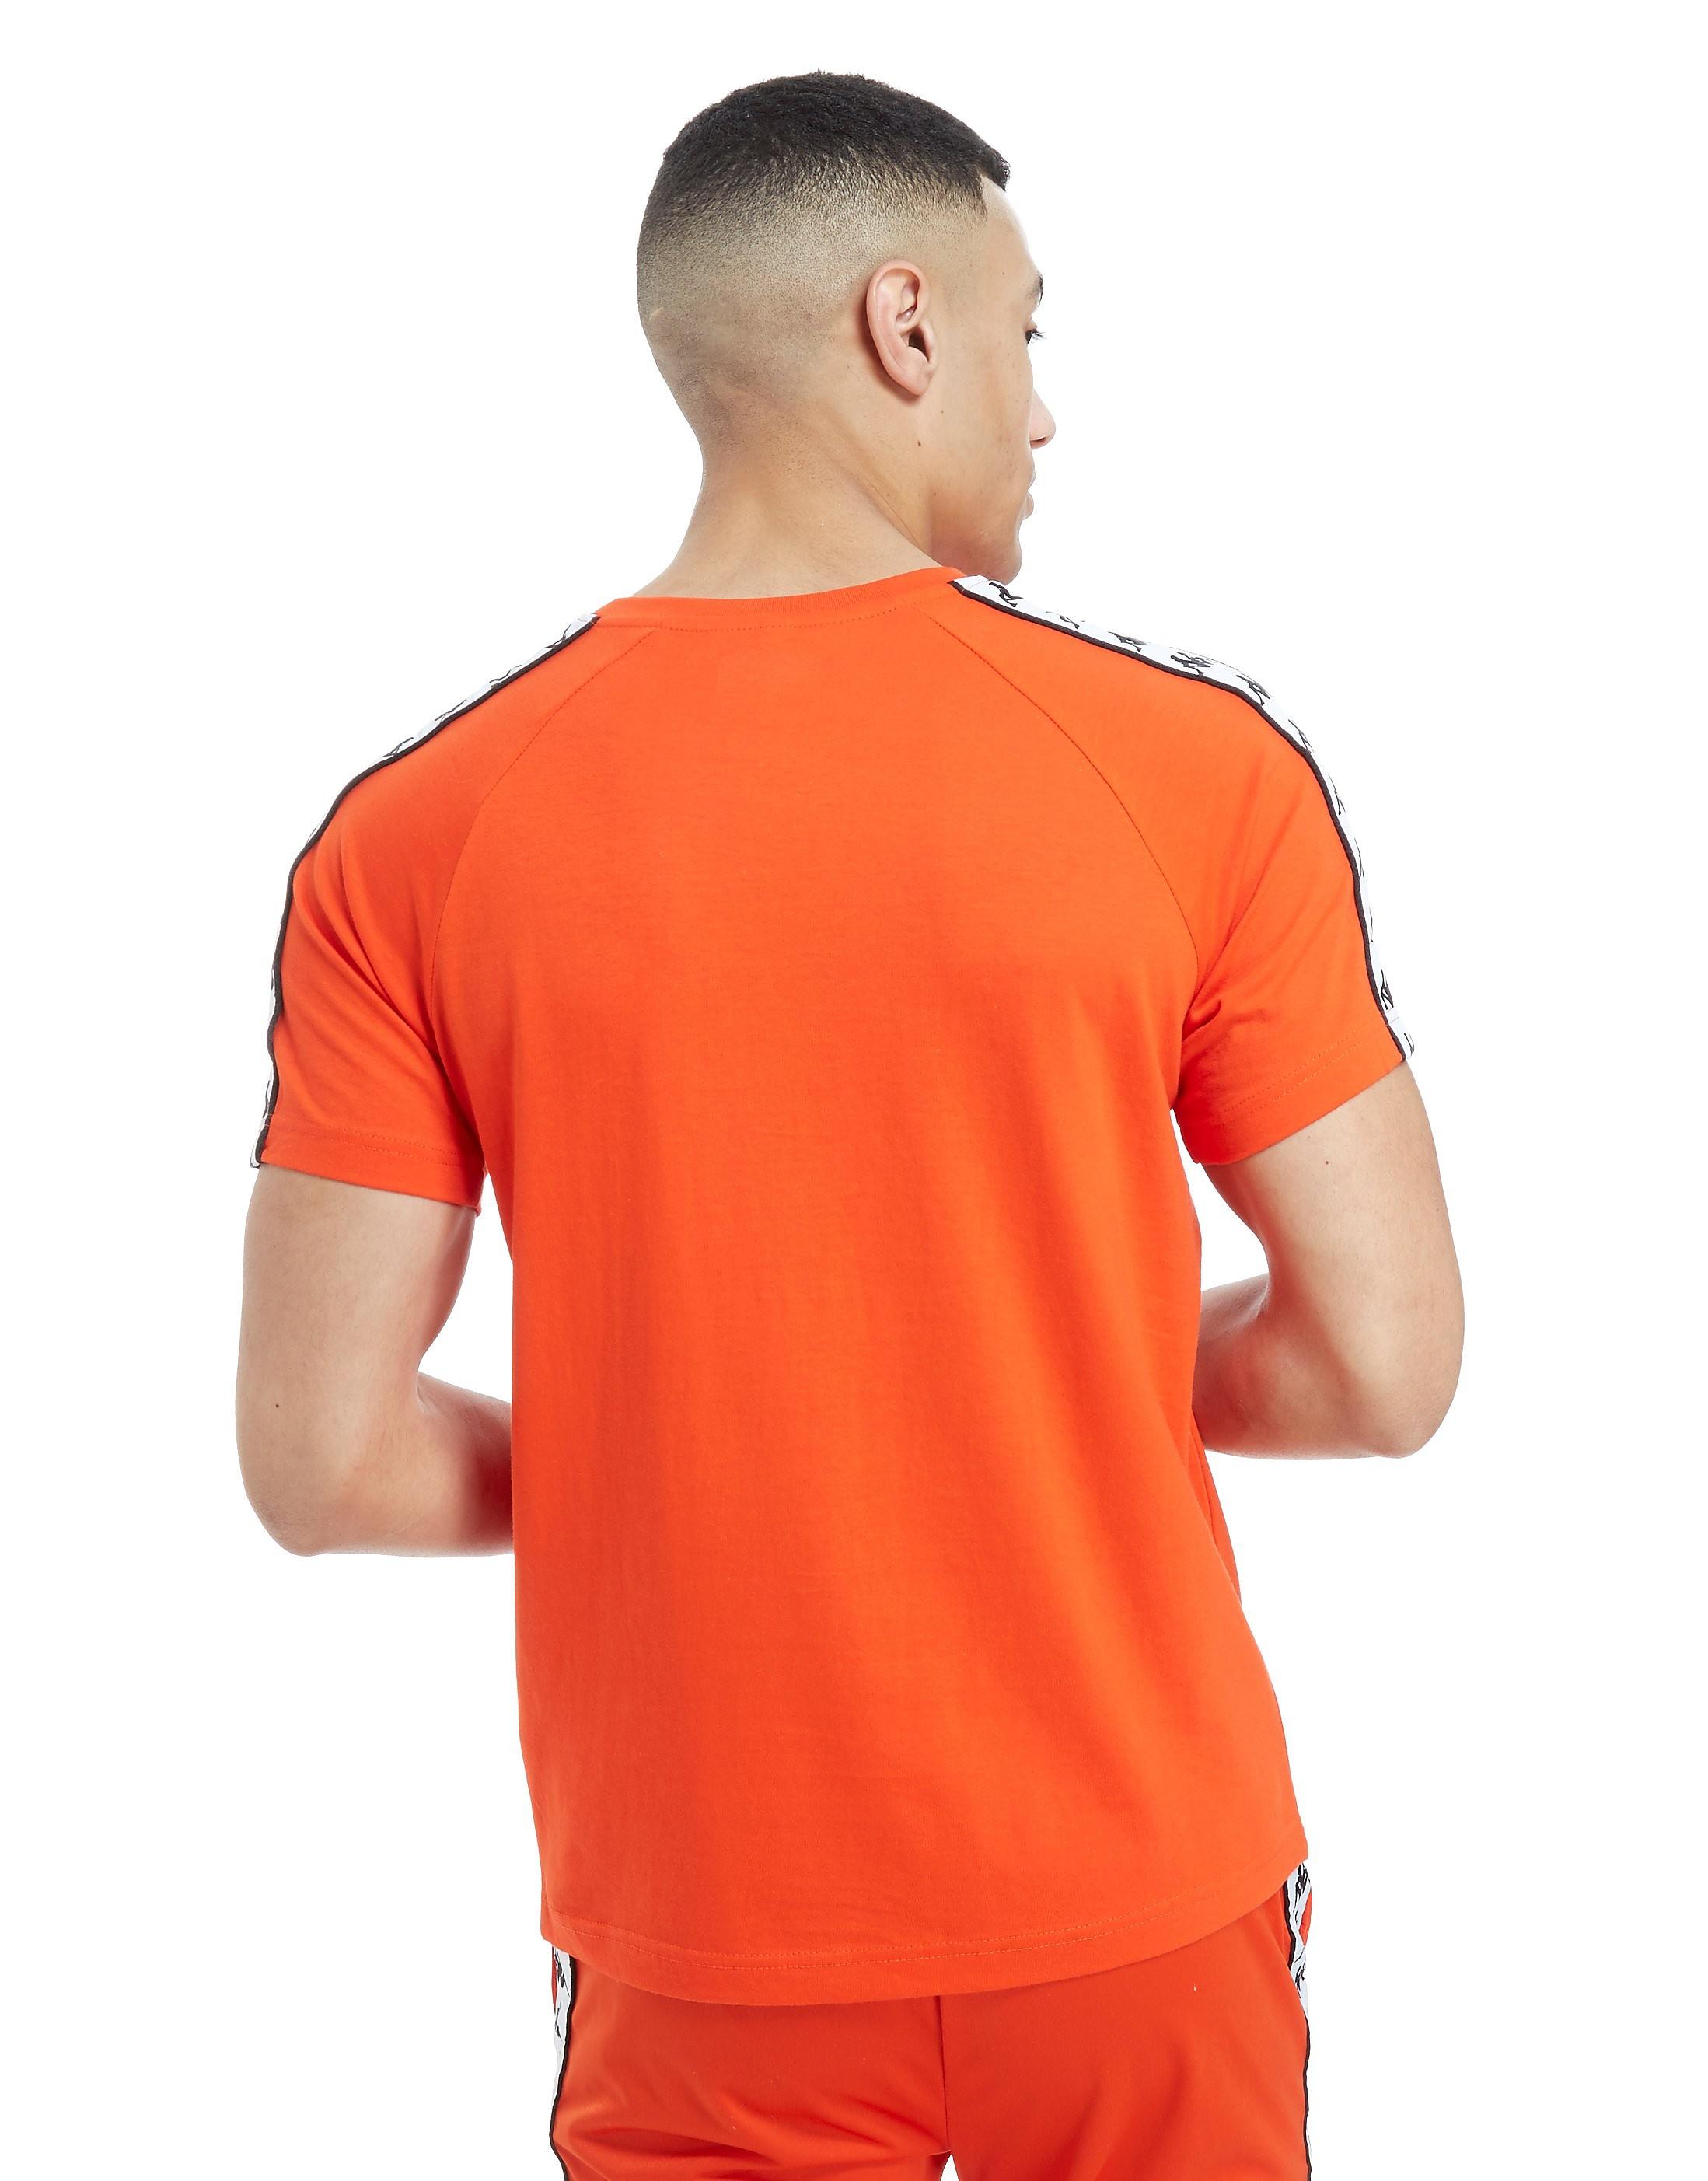 Kappa Coen Short Sleeve T-Shirt